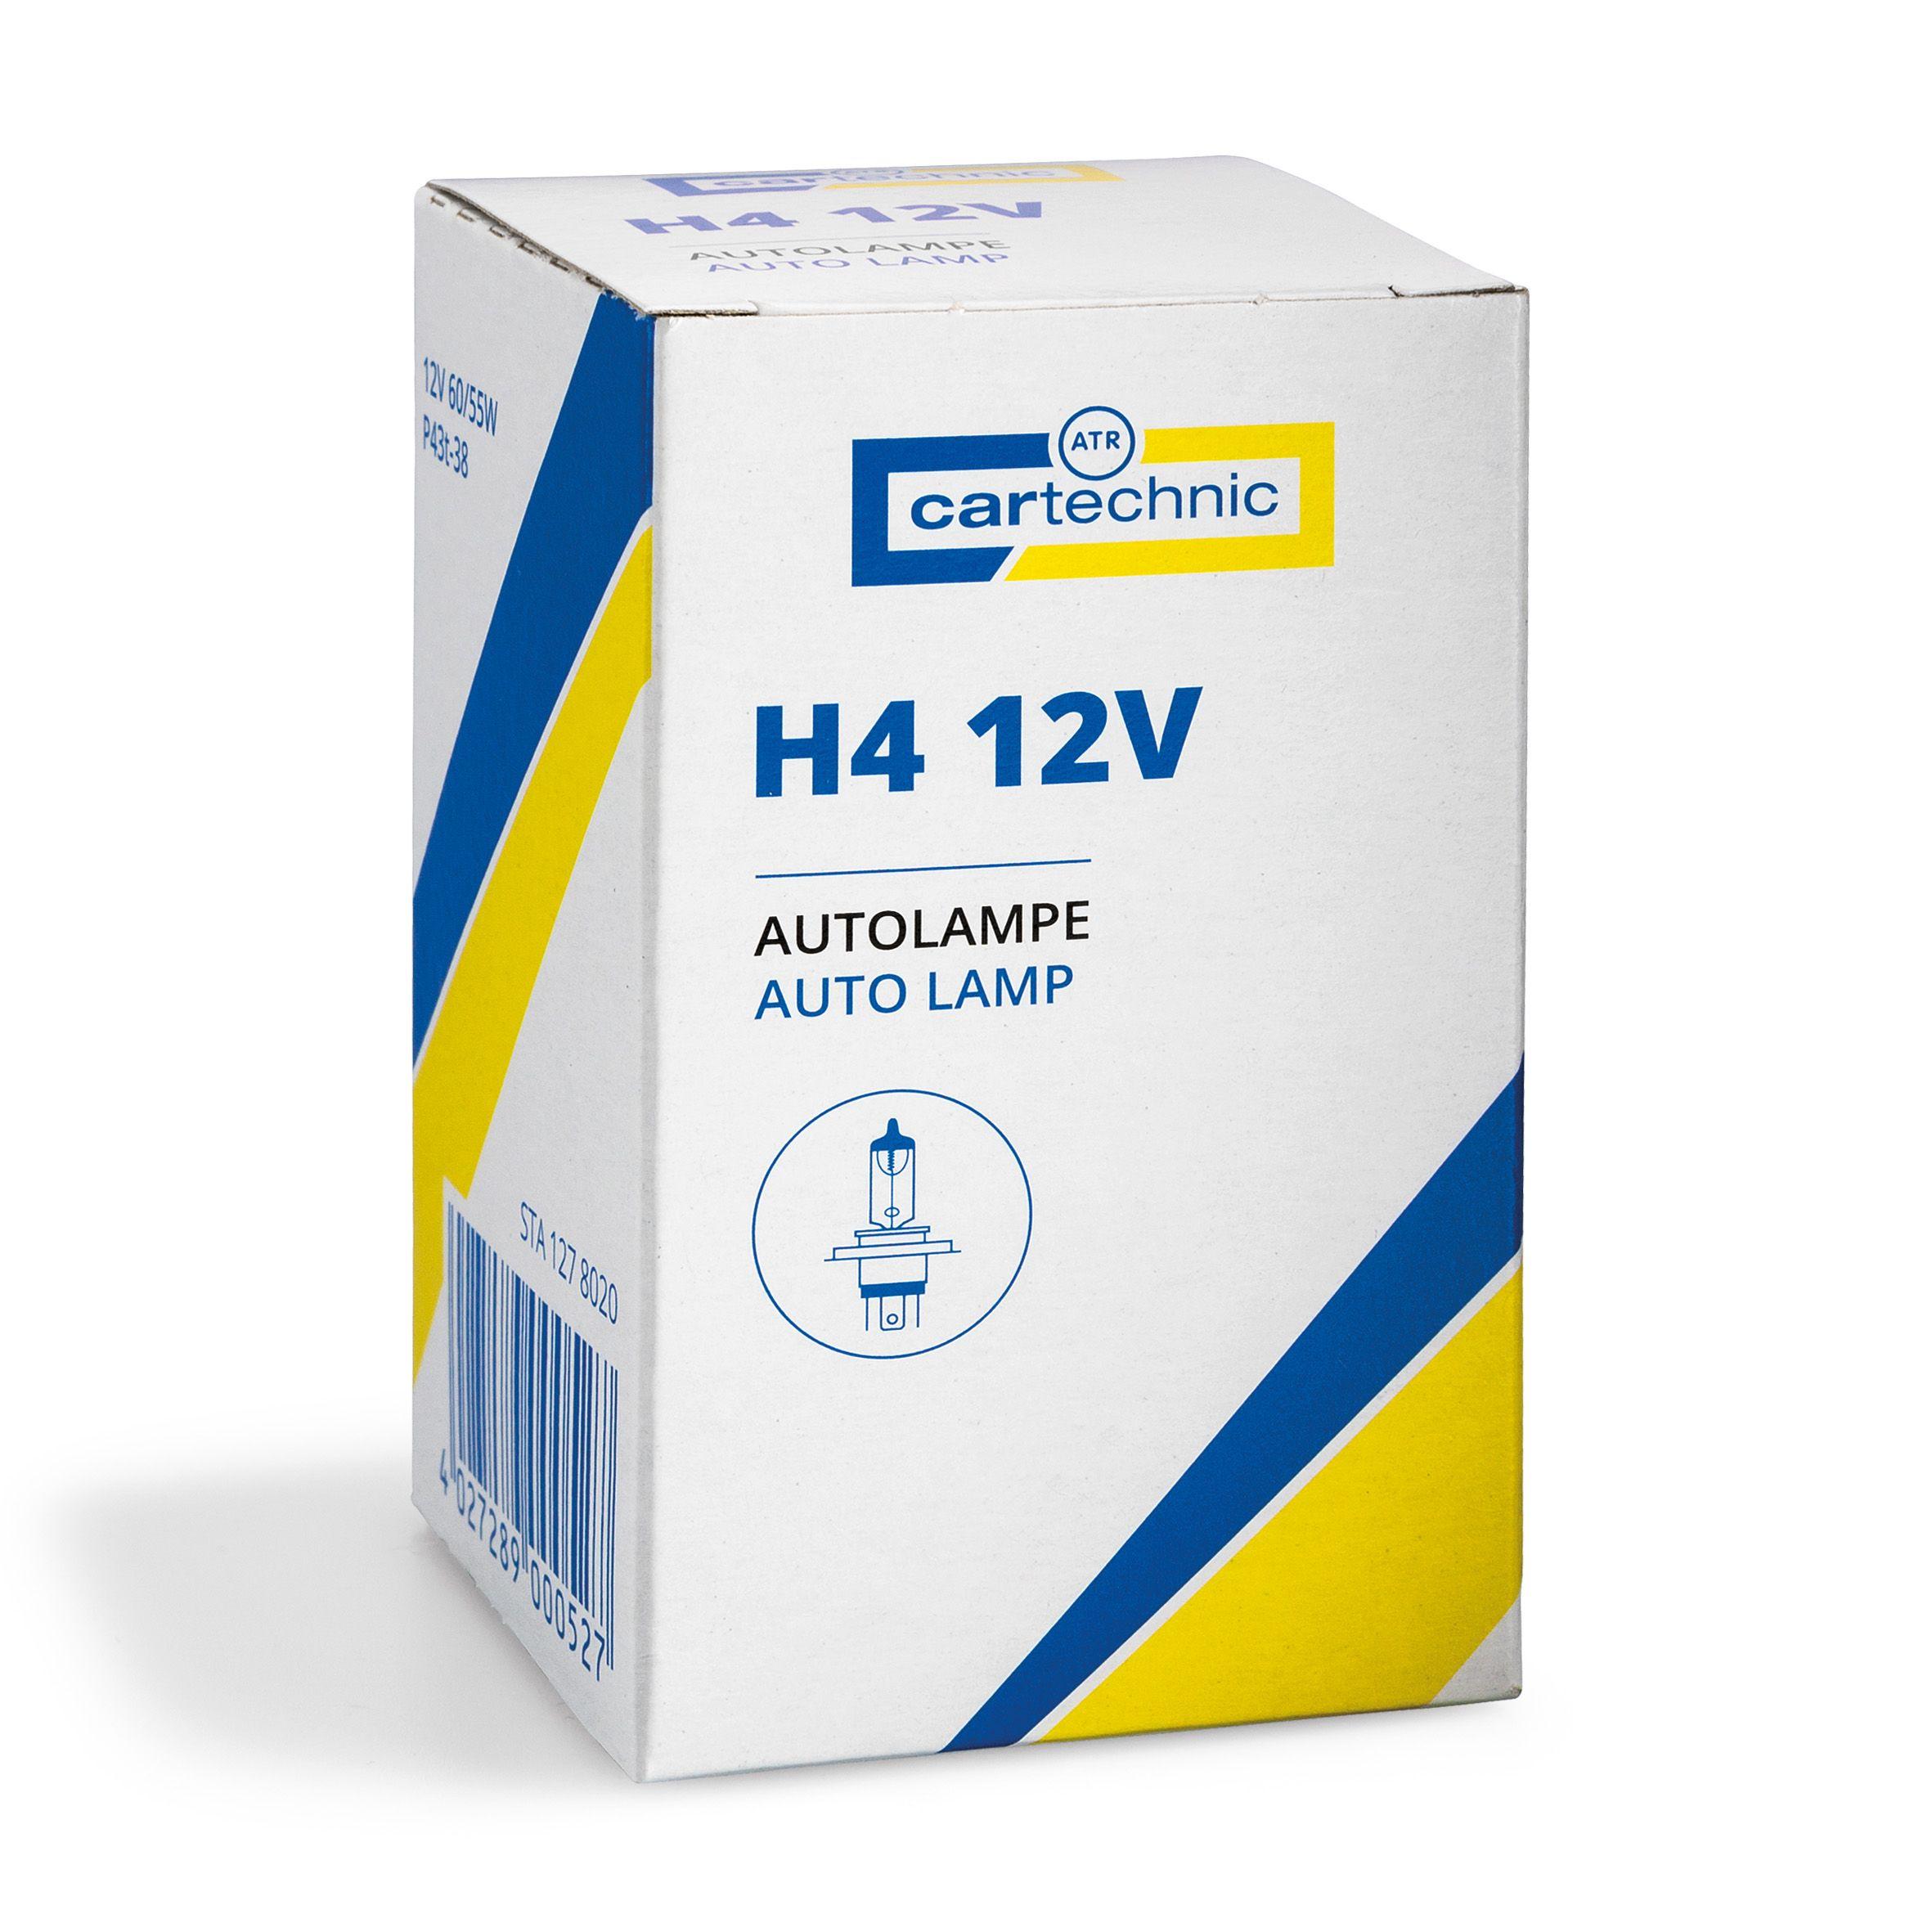 CARTECHNIC Glühlampe Glühbirne H4 12 Volt 60/55 Watt 40 27289 00052 7